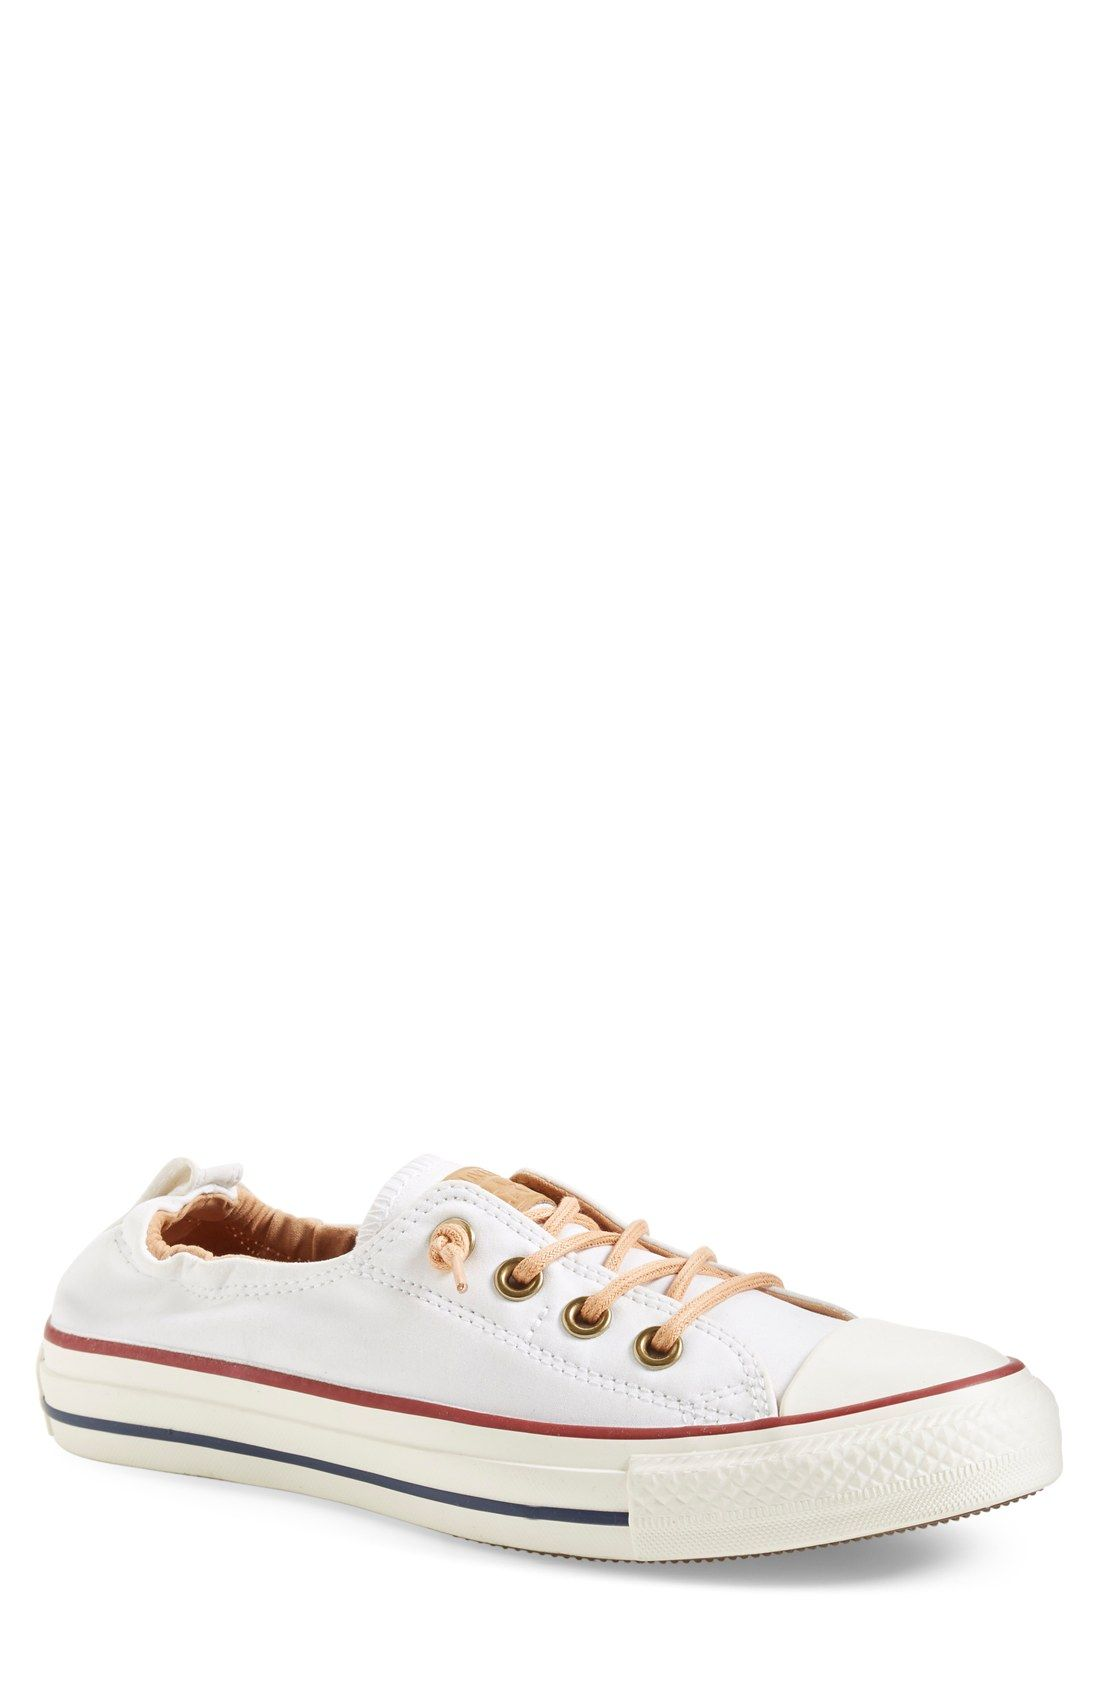 65a76ba2ea7c Converse Chuck Taylor® All Star®  Peached - Shoreline  Low Top Slip-On  Sneaker (Women)